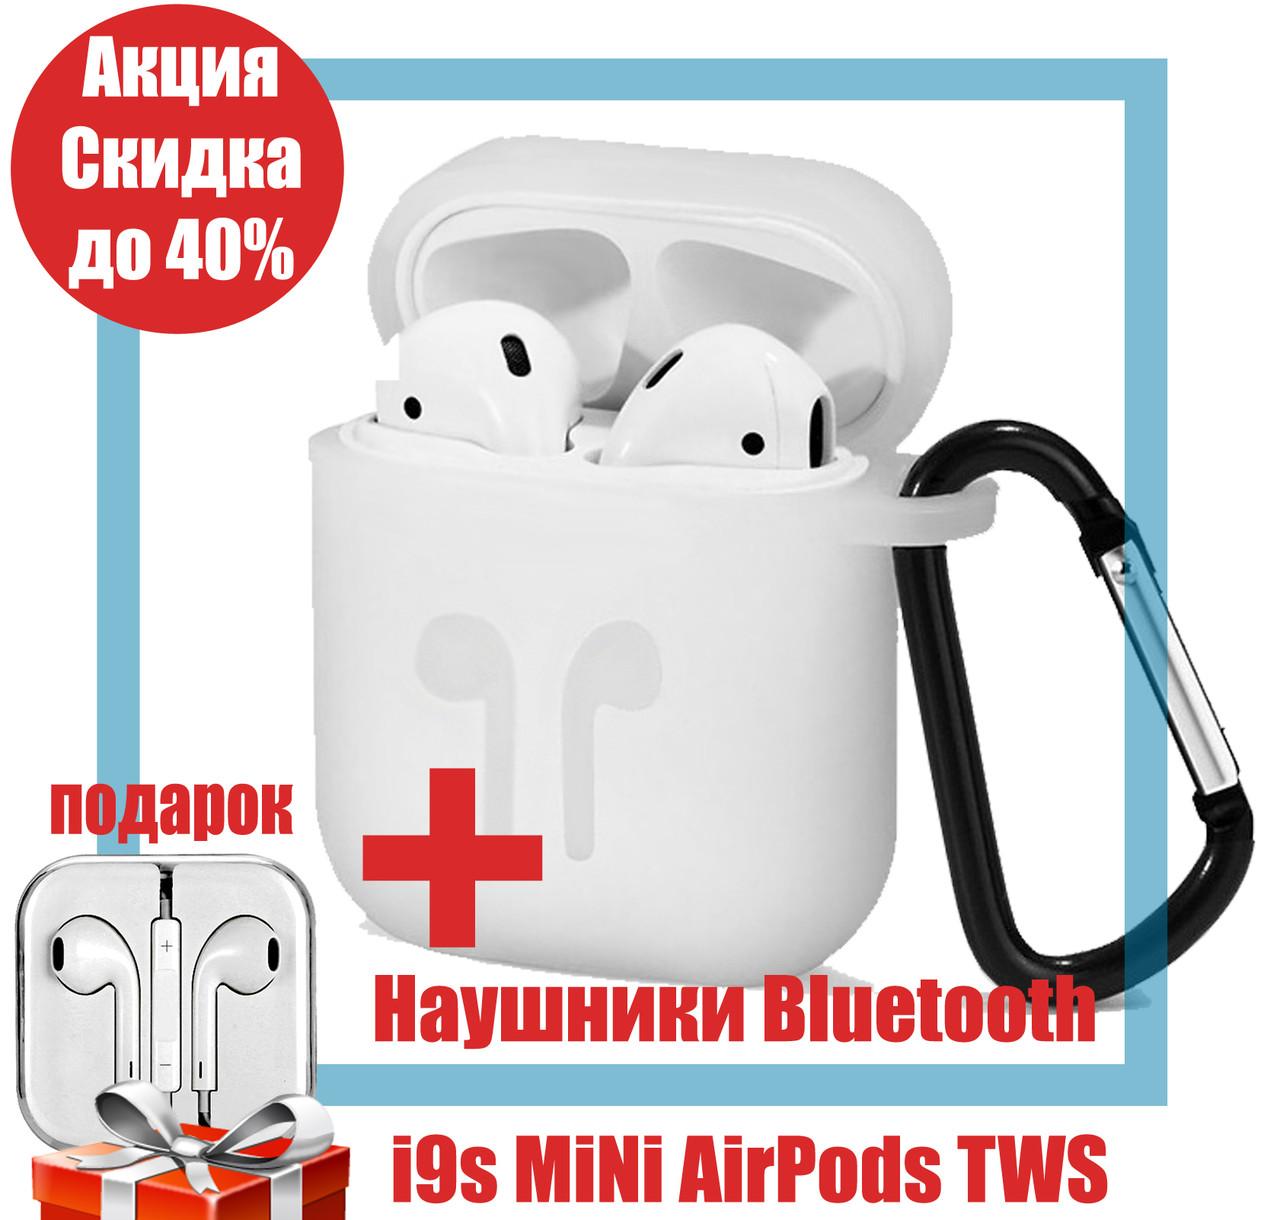 Наушники I9S-TWS MINI оригинал гарнитура наушники Bluetooth с кейсом PowerBank 1000mah QualitiReplica